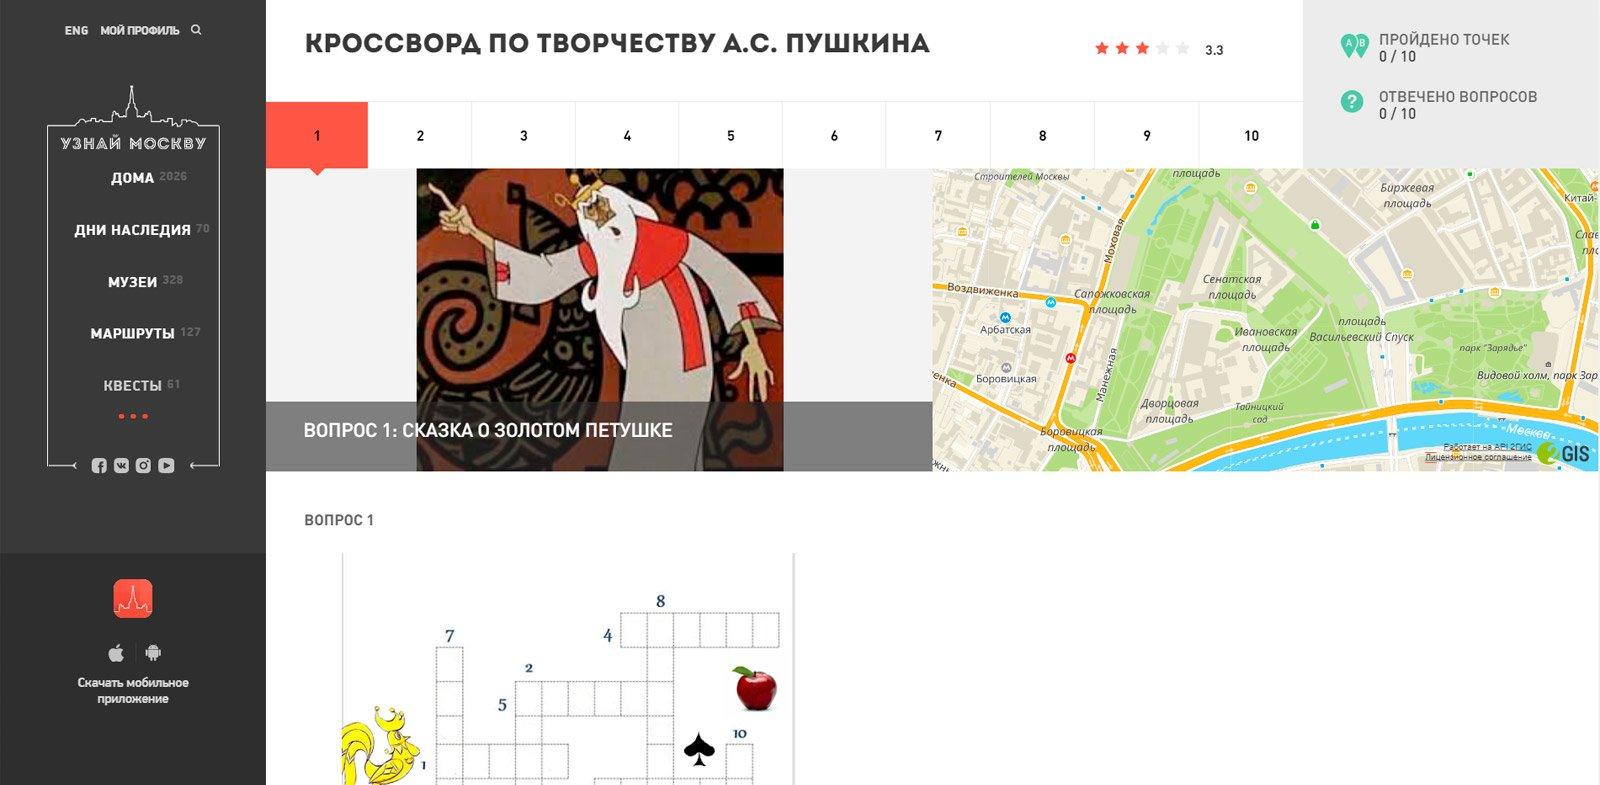 На портале «Узнай Москву» появился онлайн-кроссворд по творчеству Пушкина